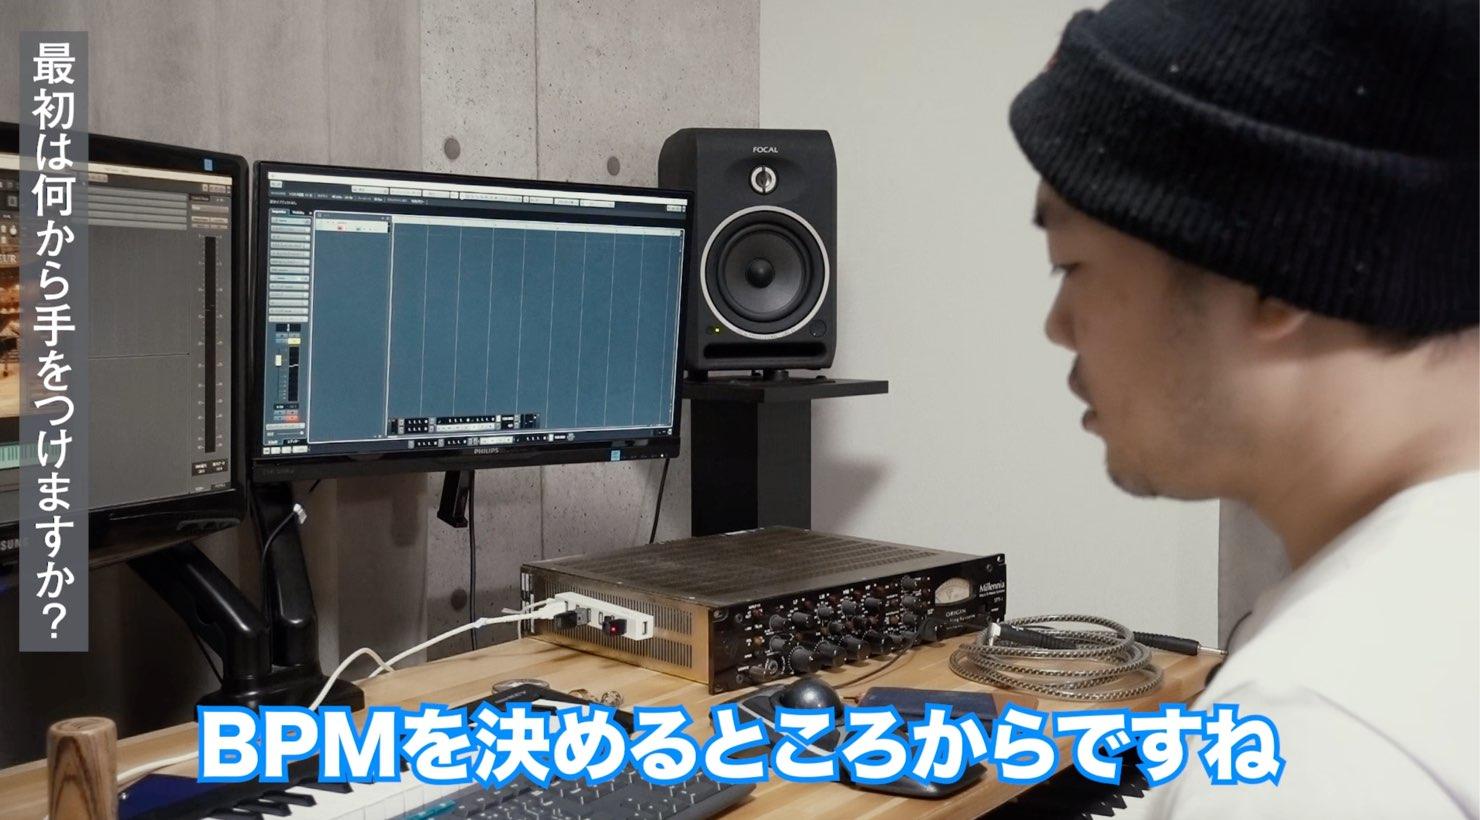 Yusuke-Shirato-Tips-1-BPM-Tempo-Cubase